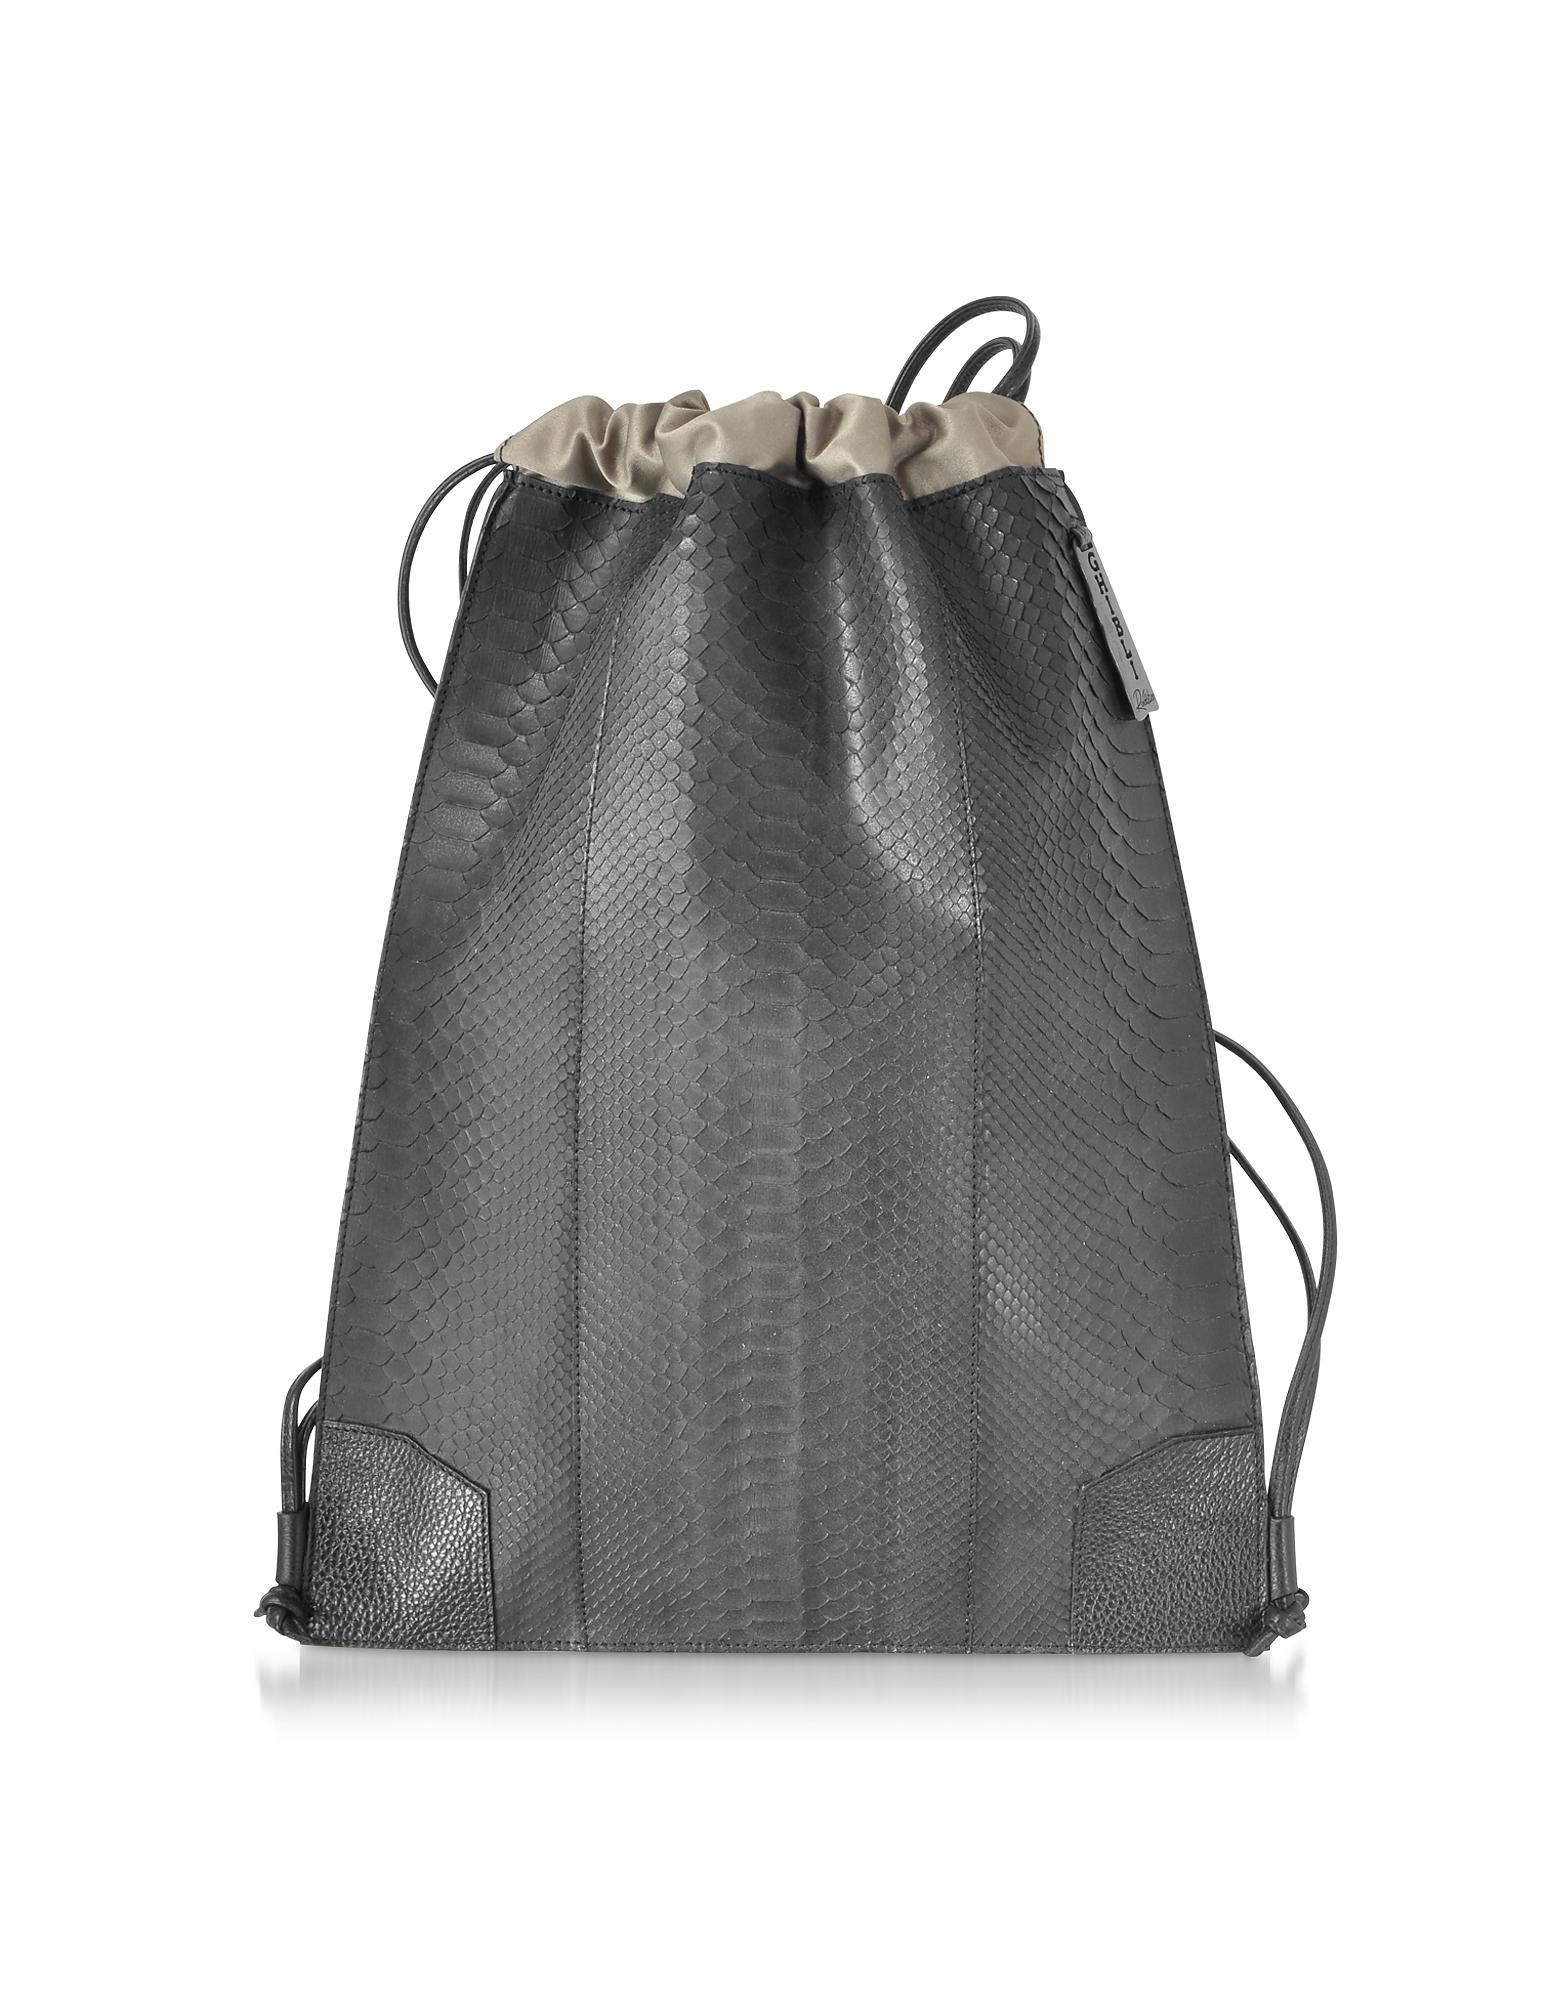 Ghibli Designer Handbags, Python and Calf Leather Backpack